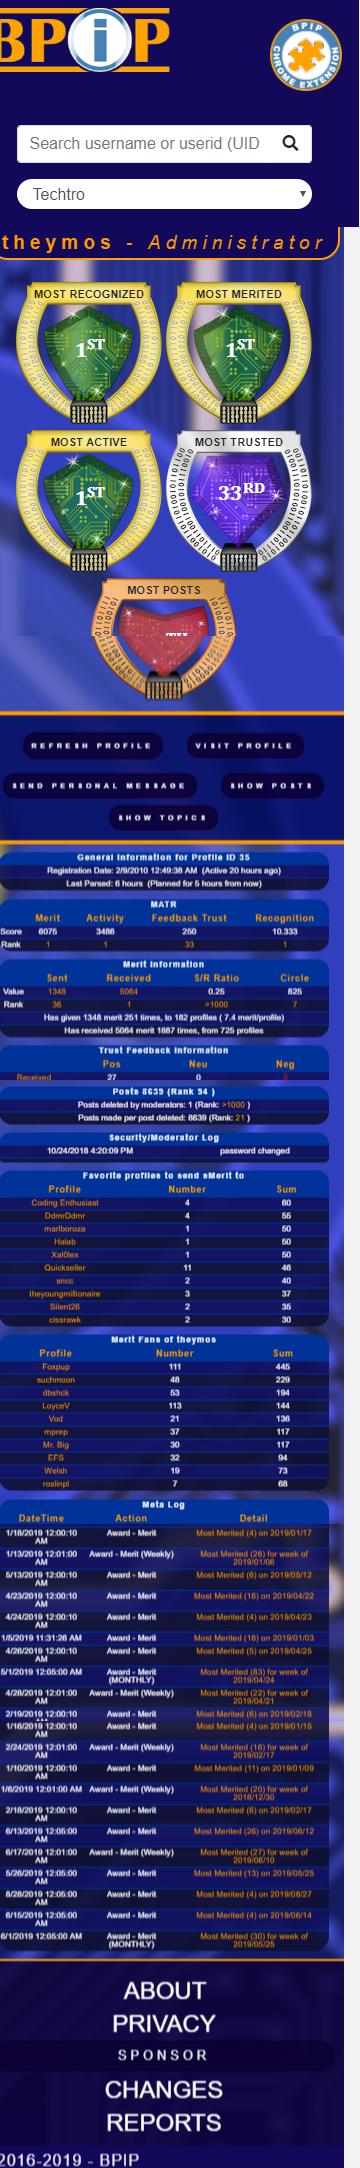 screencapture-bpip-org-profile-aspx-2019-08-28-23-59-02